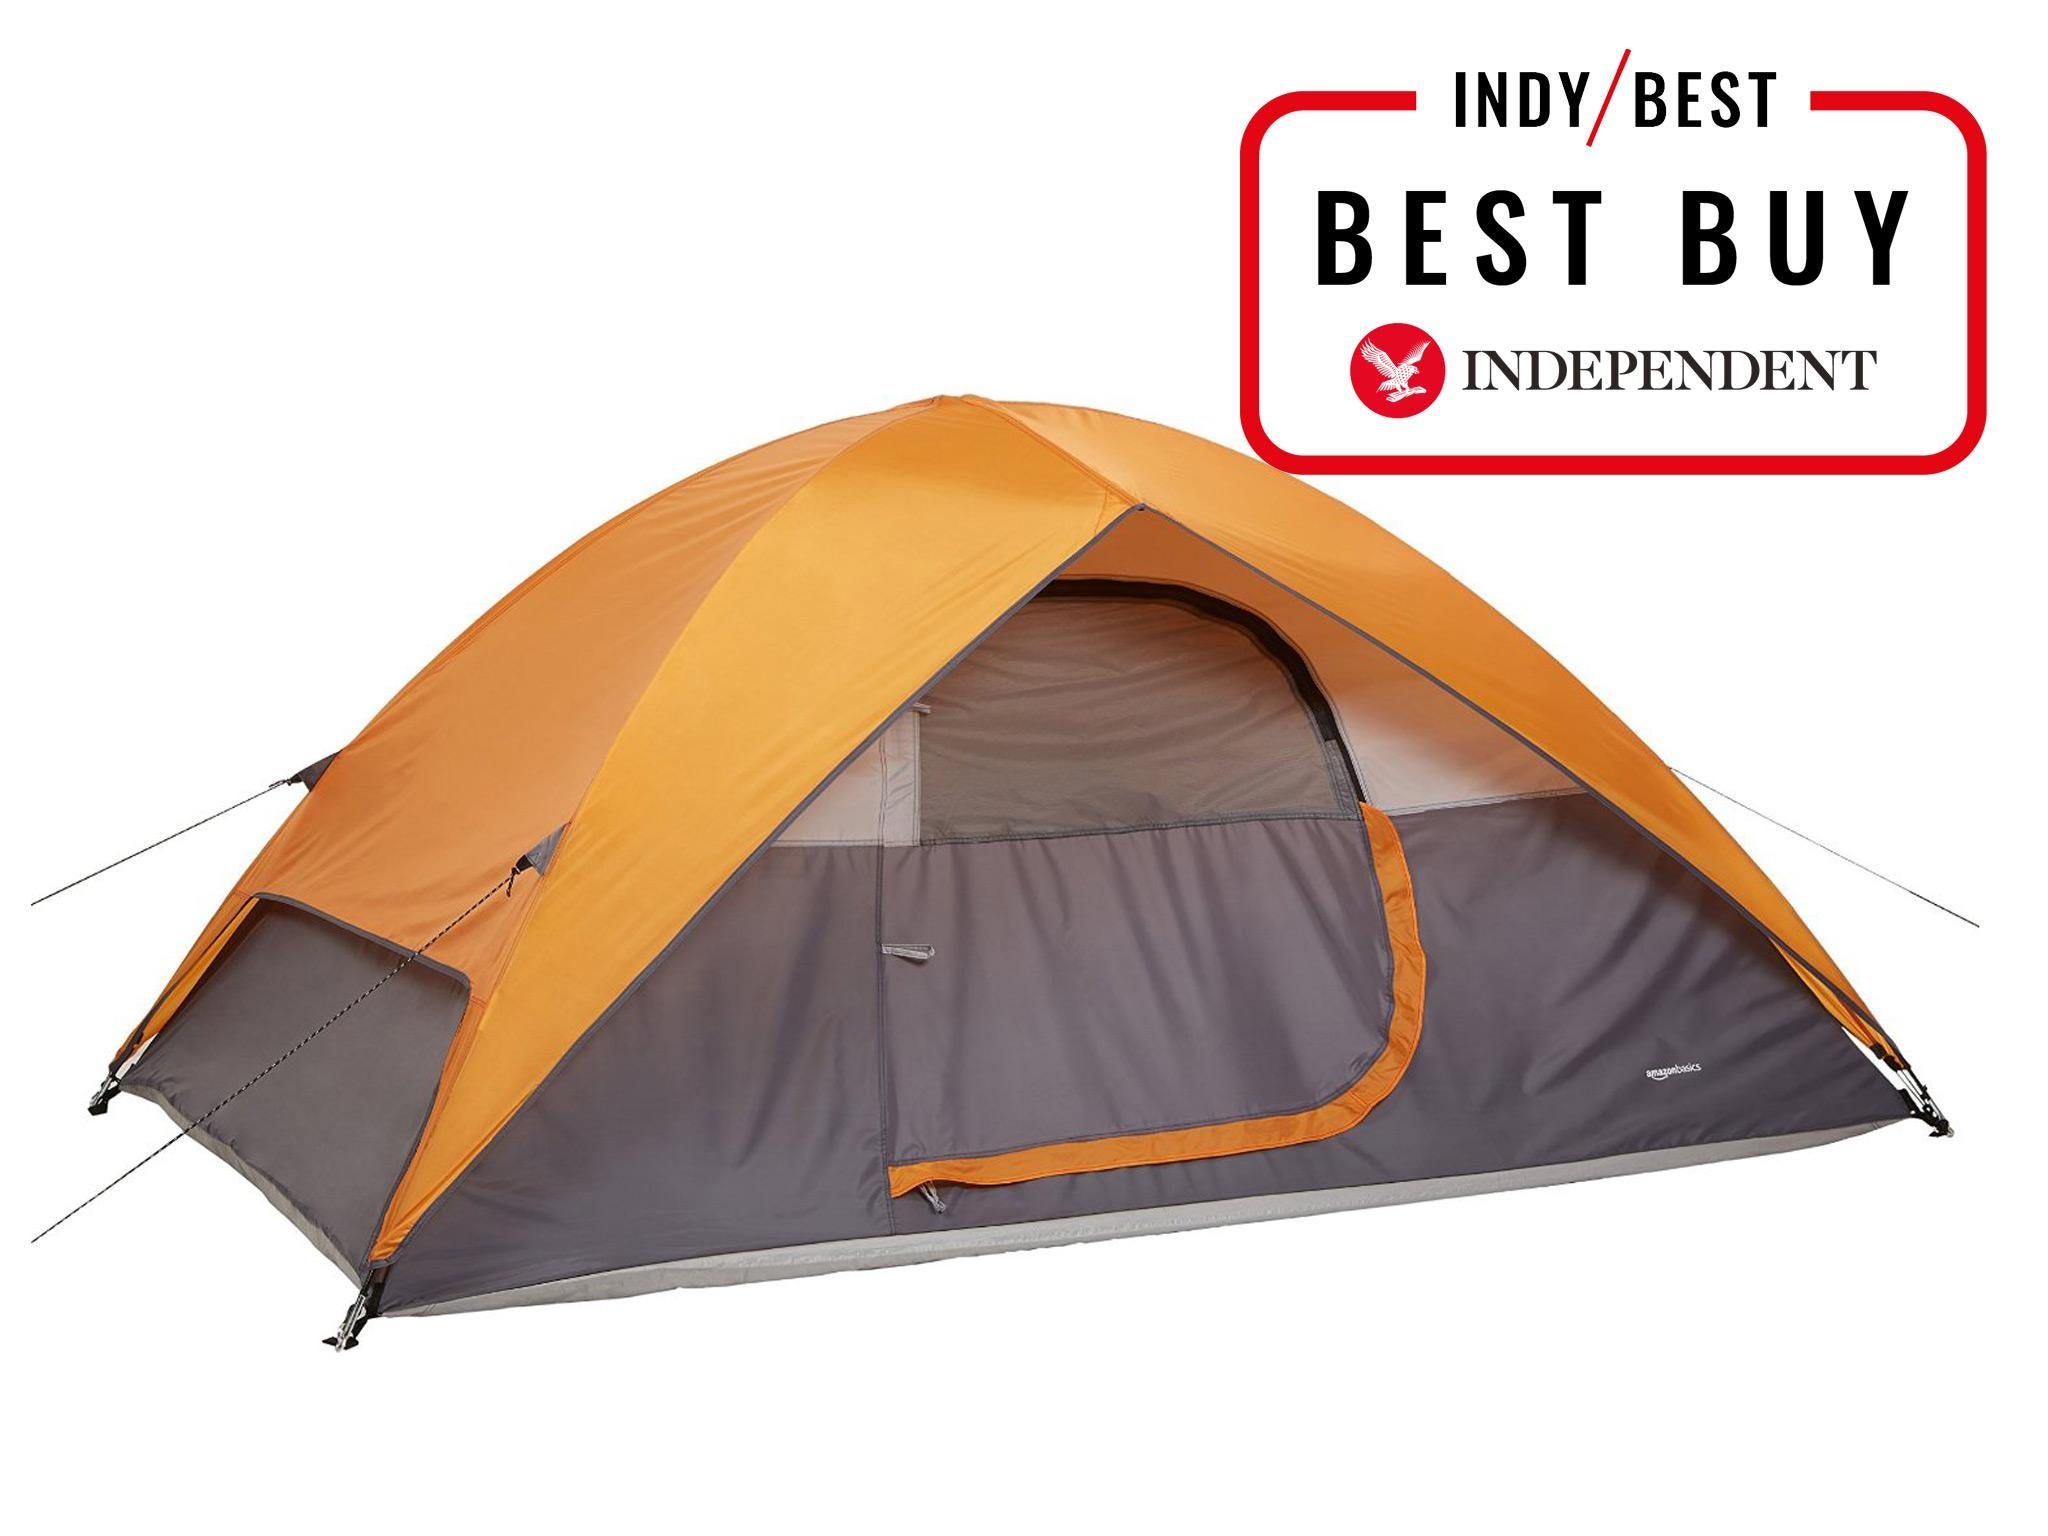 775f61810d7 AmazonBasics Tent  £49.99